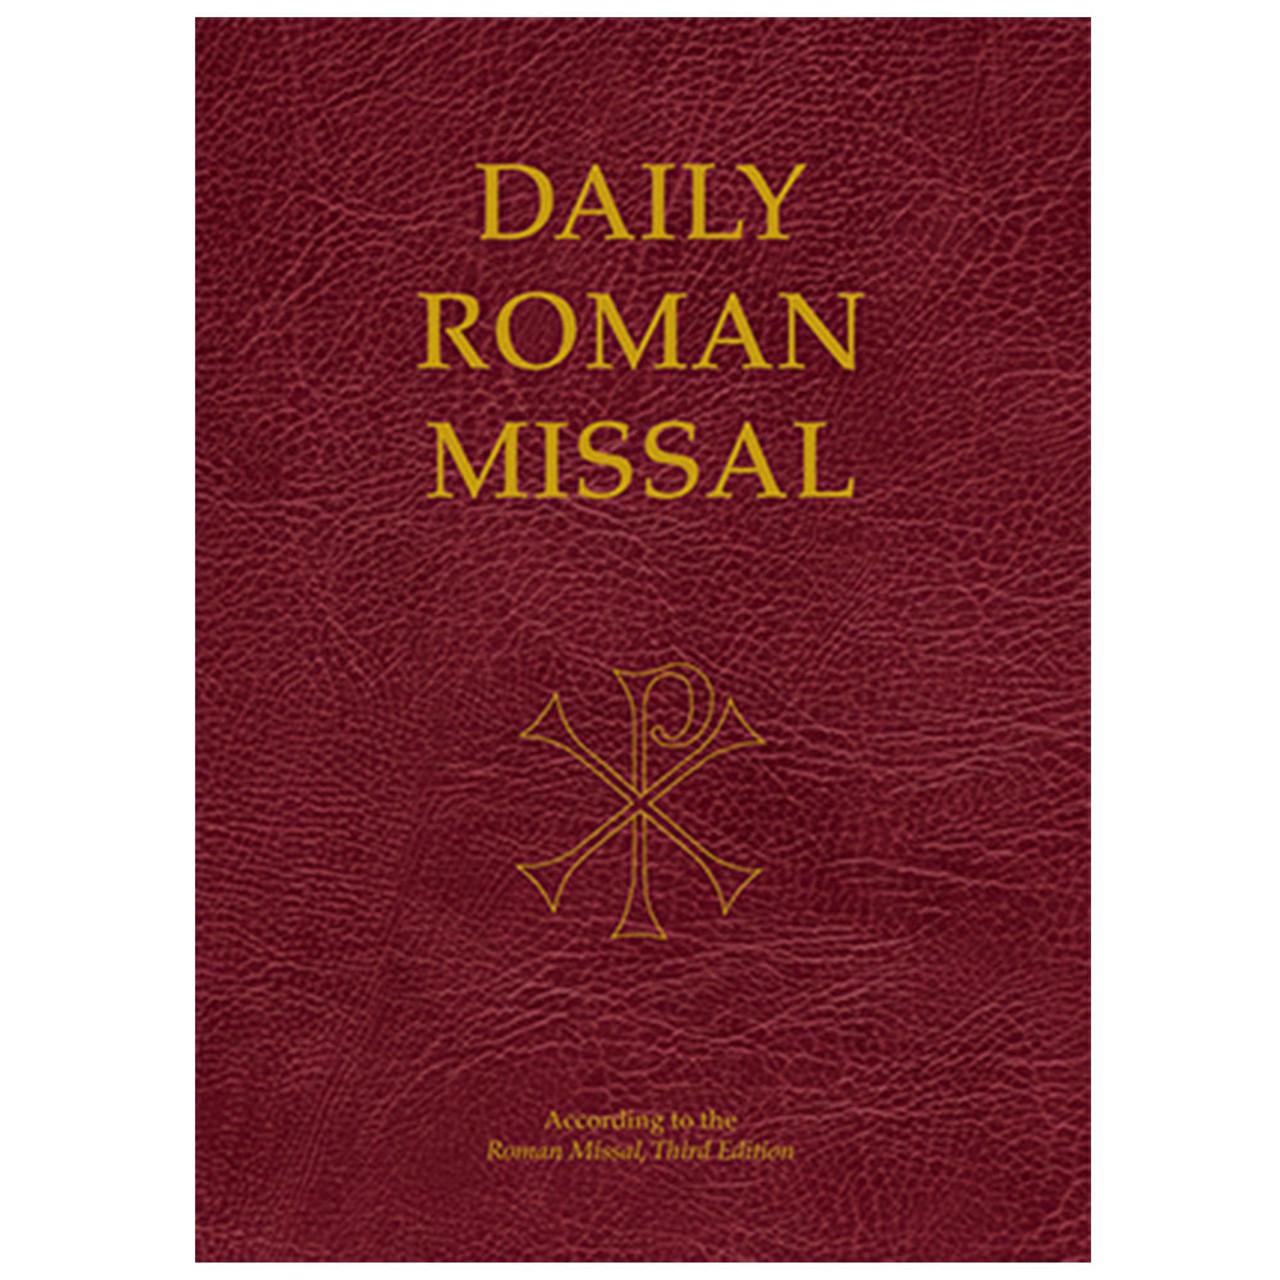 Daily Roman Missal Third Edition